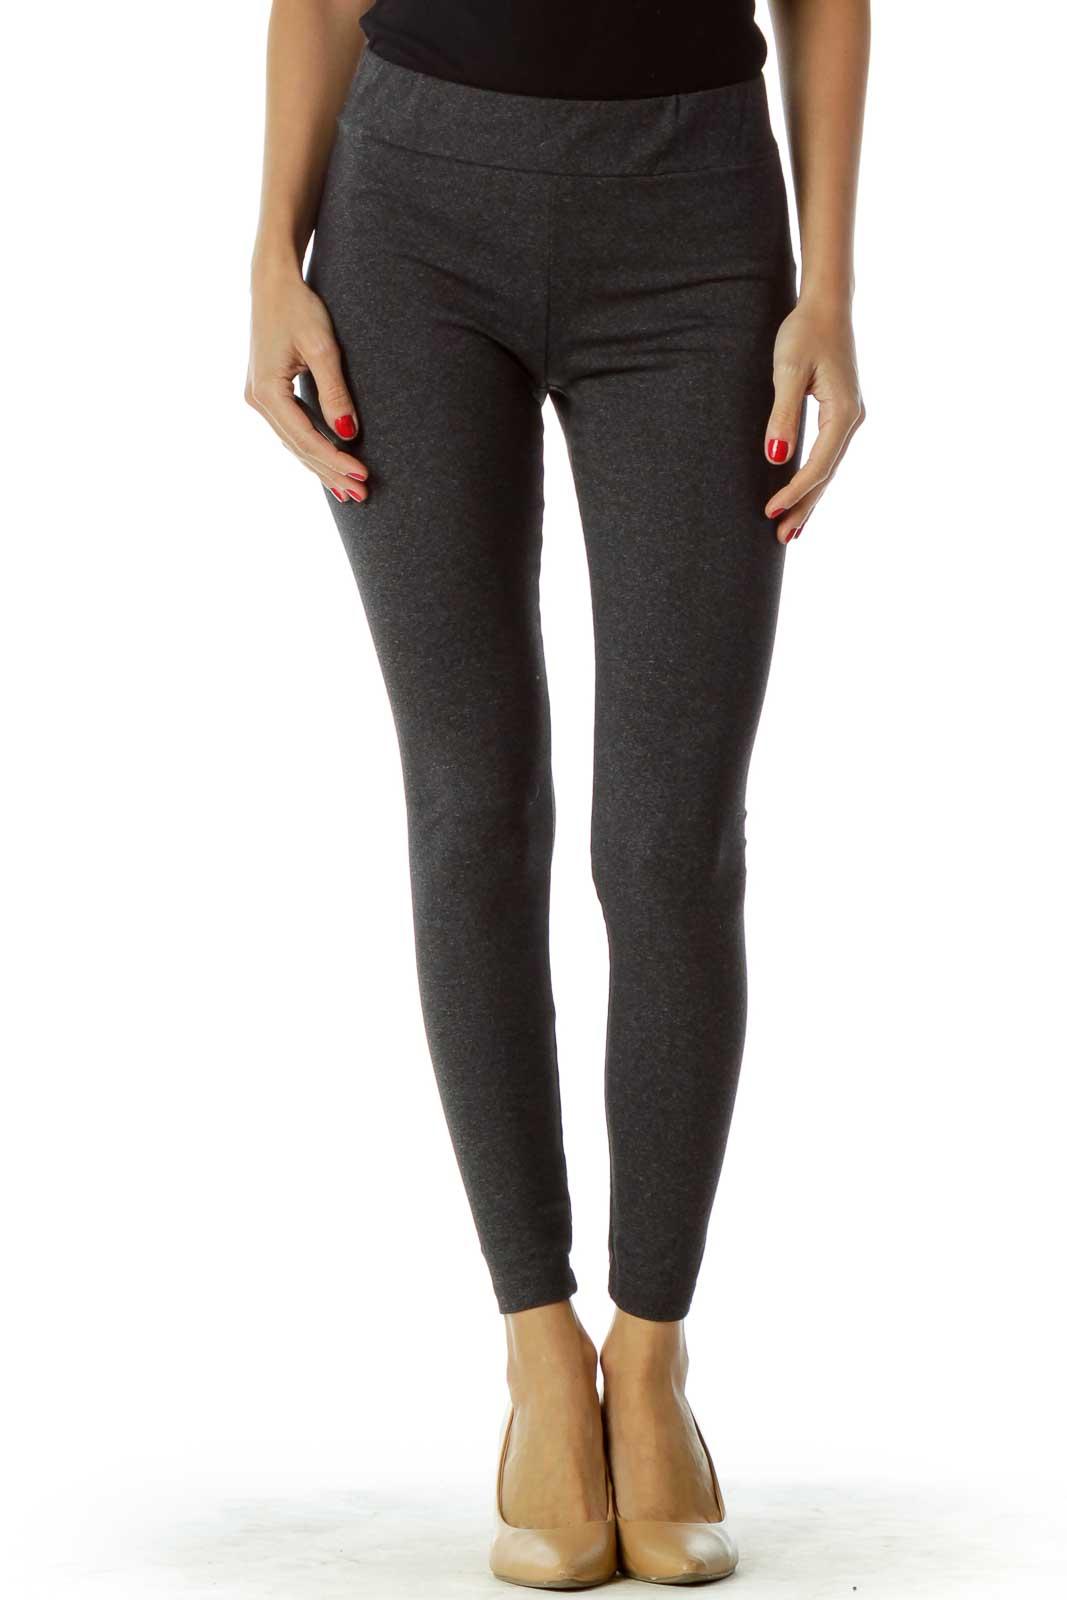 Grey Activewear Leggings Front